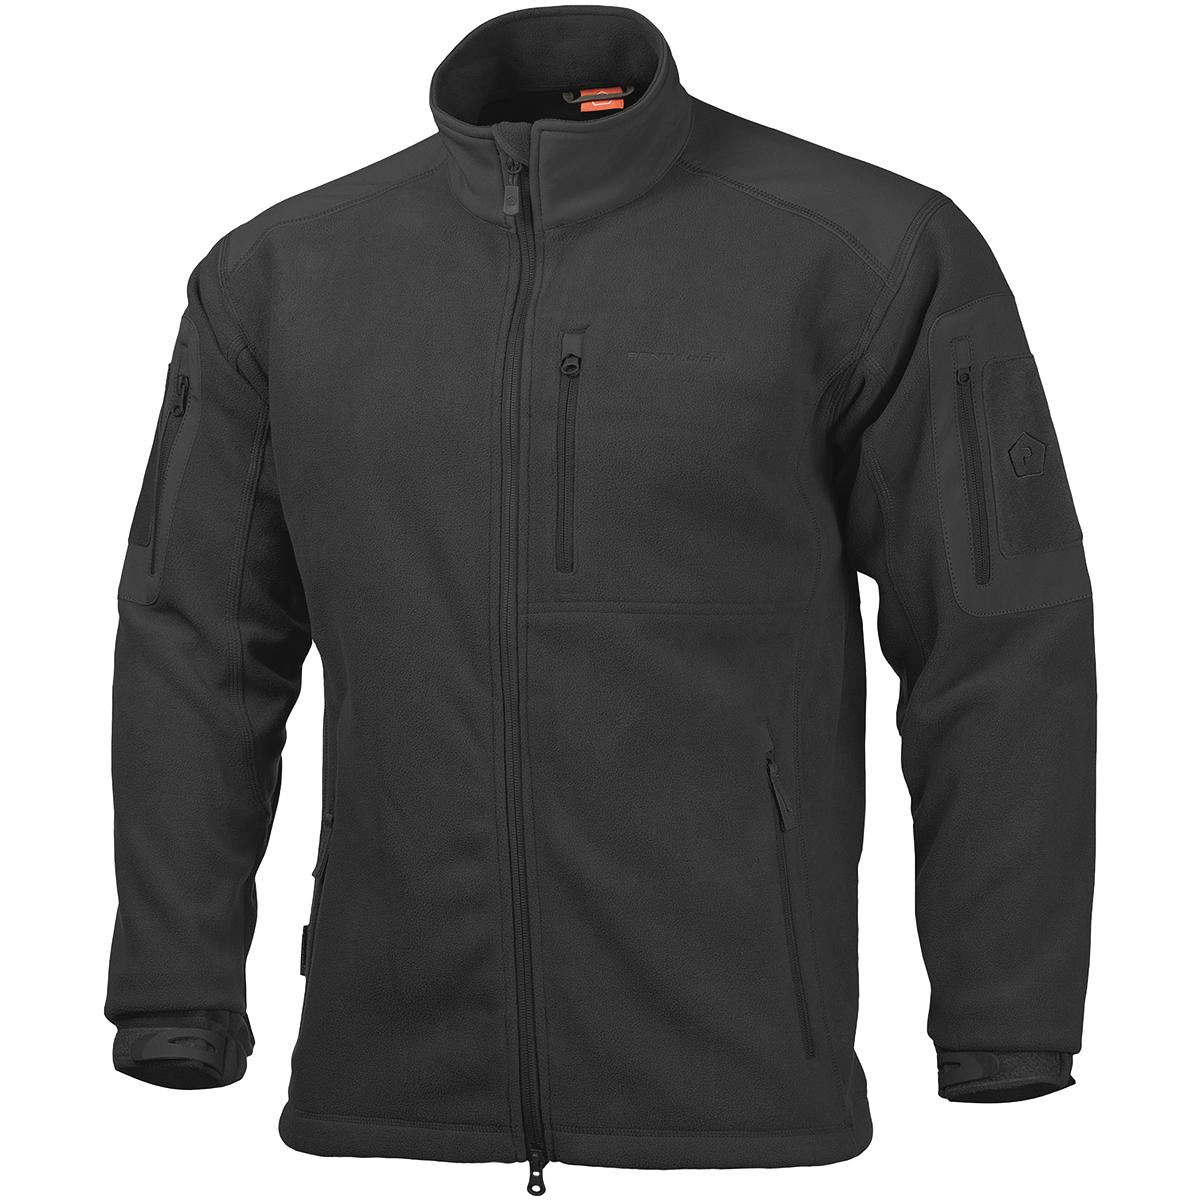 About 2 0 Security Jacket Mens Black Coat Fleece Details Perseus Army Tactical Pentagon Double IEH9W2YD